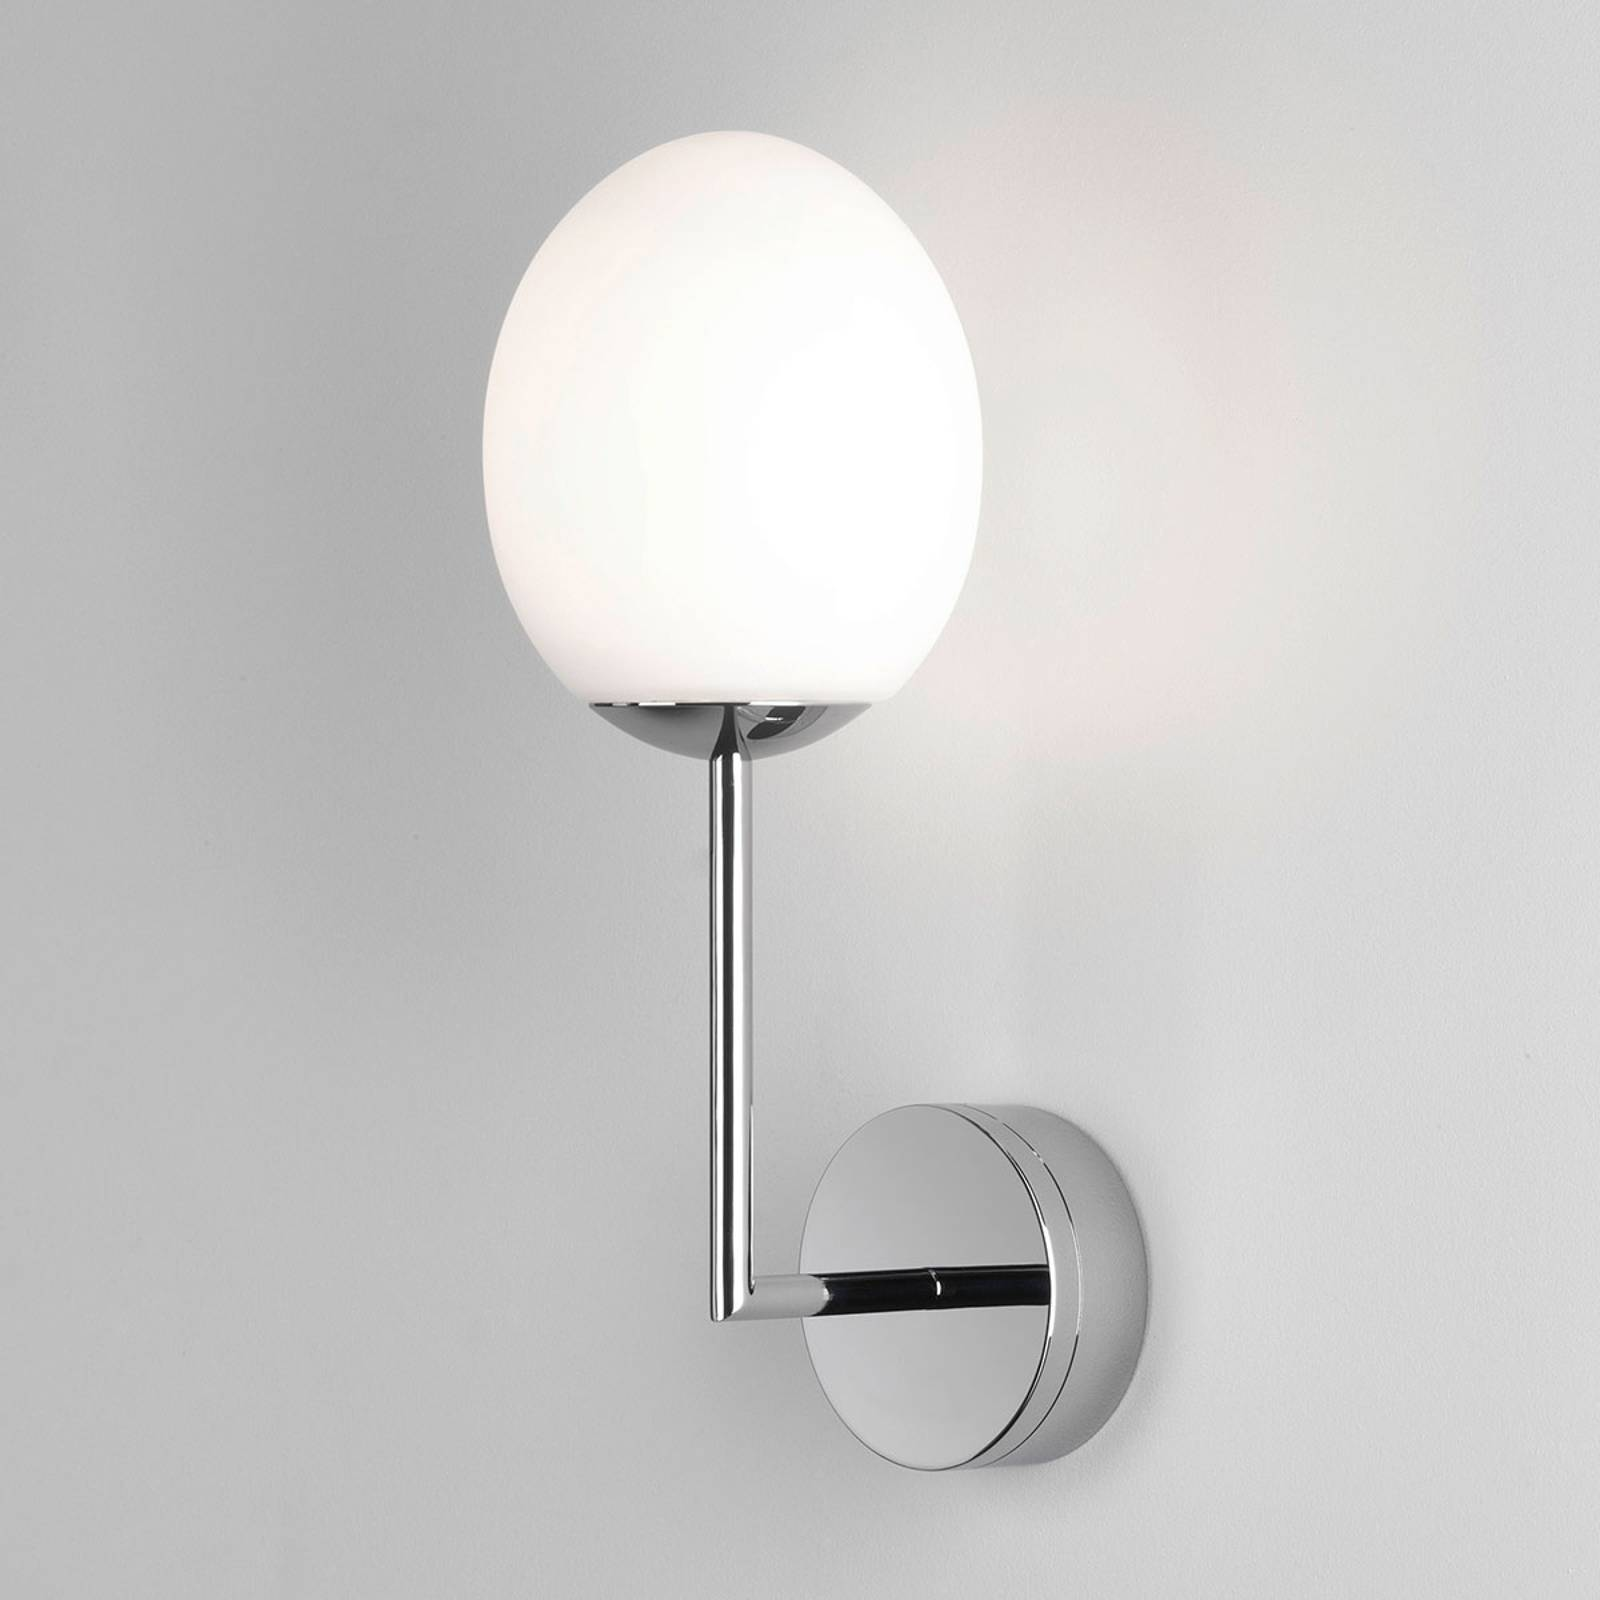 Astro Kiwi LED-Wandleuchte fürs Bad, chrom